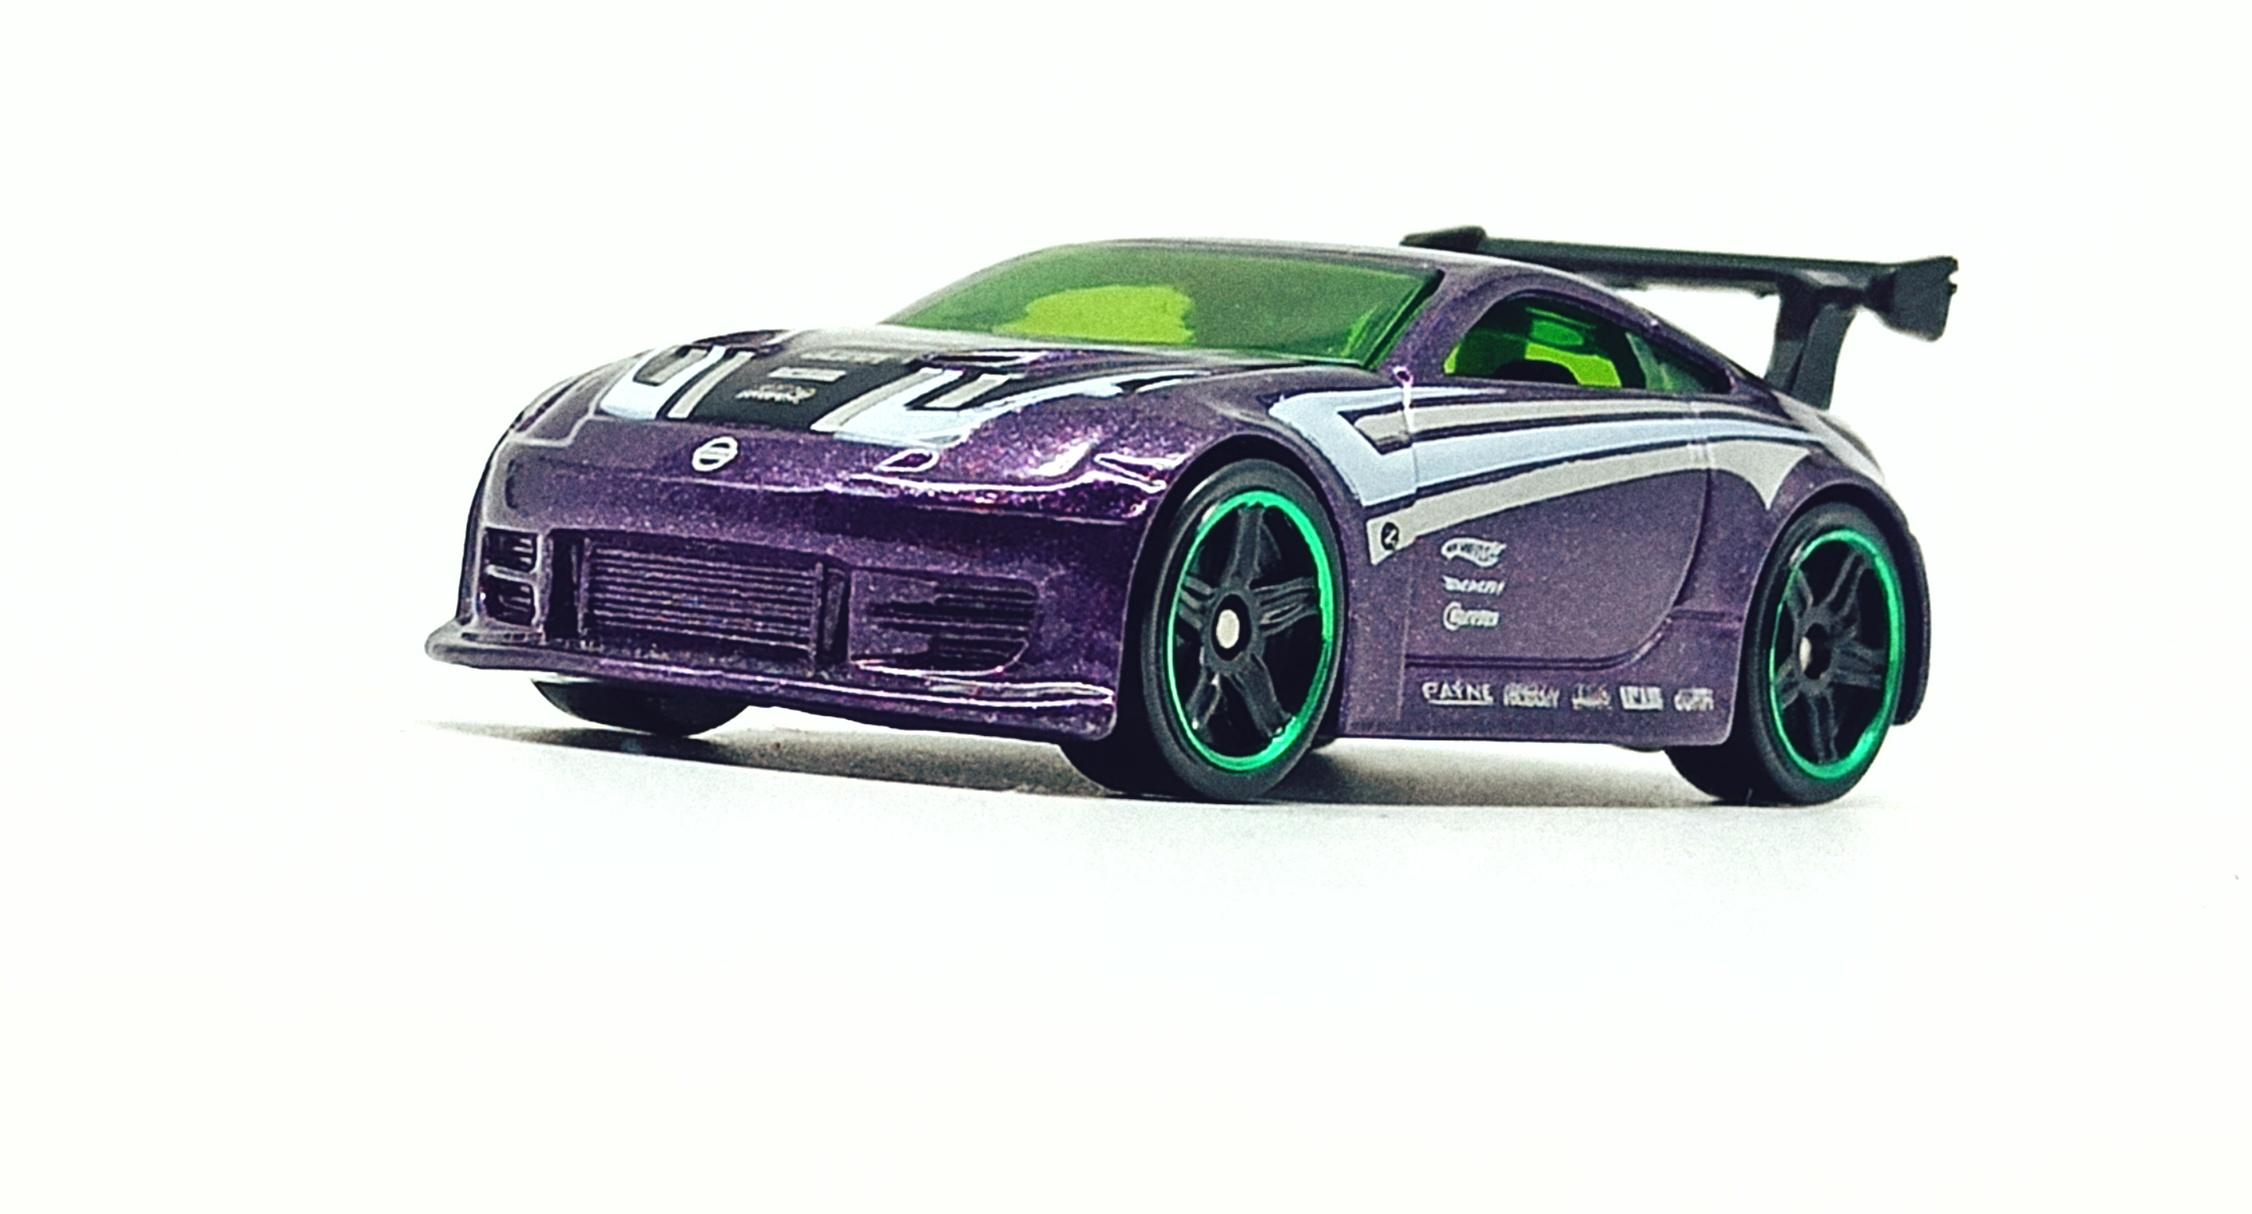 Hot Wheels Nissan 350Z (R7487) 2010 (234/240) Mystery Cars (18/24) purple side angle